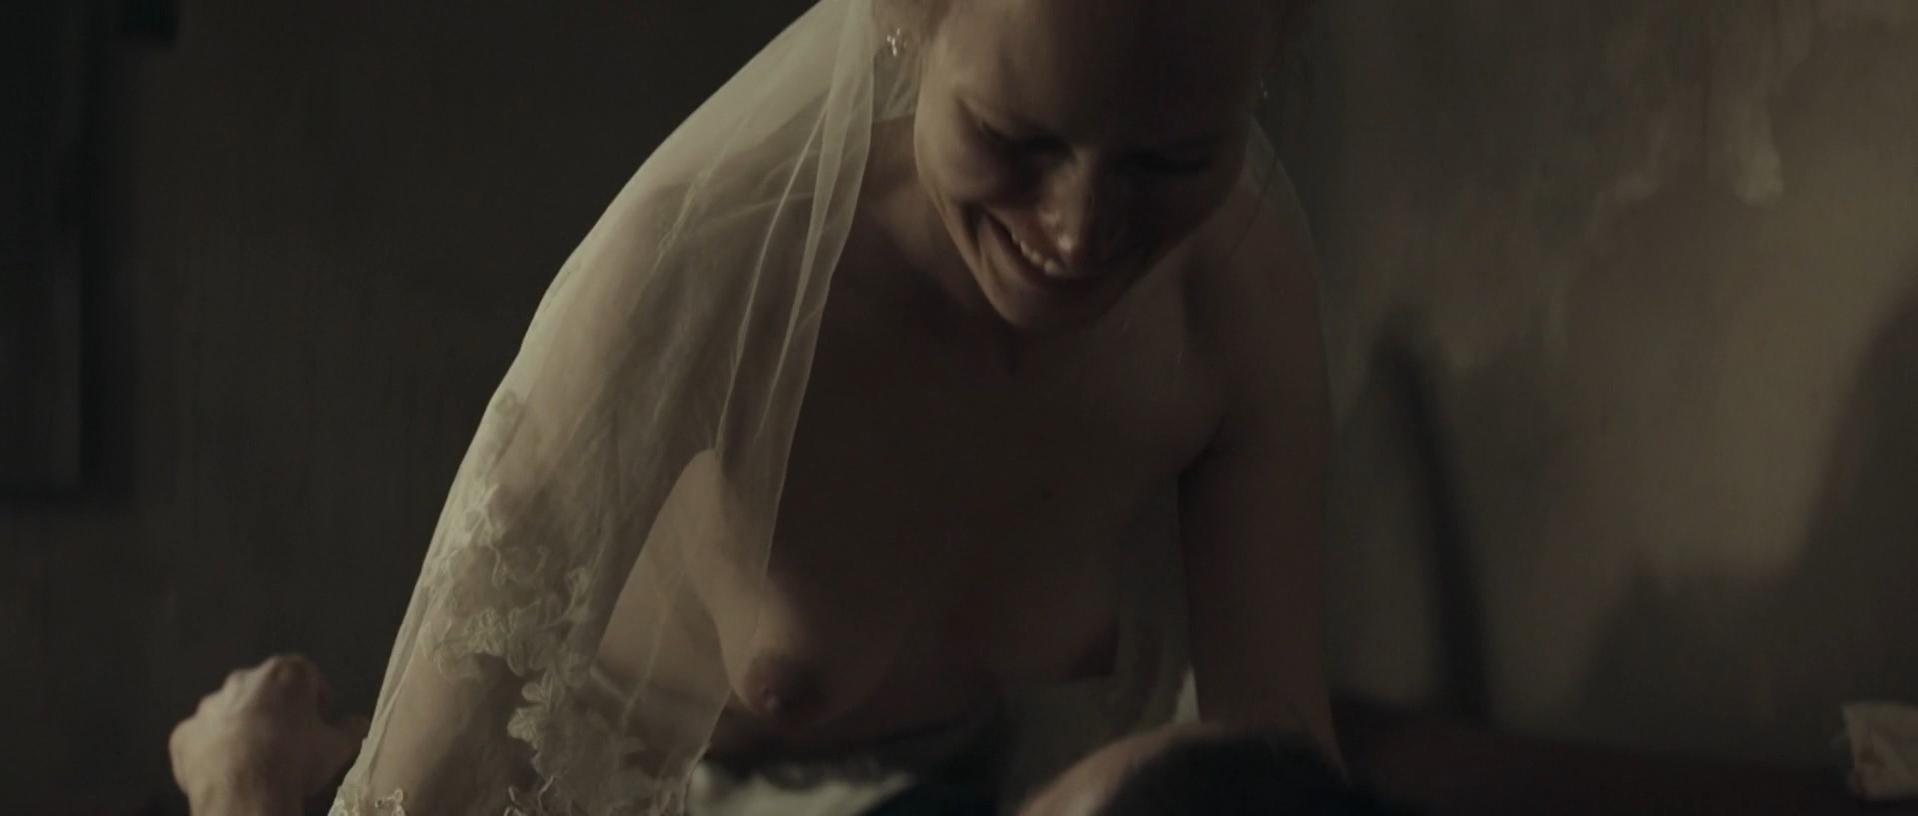 Agnieszka Zulewska nude - Demon (2015)